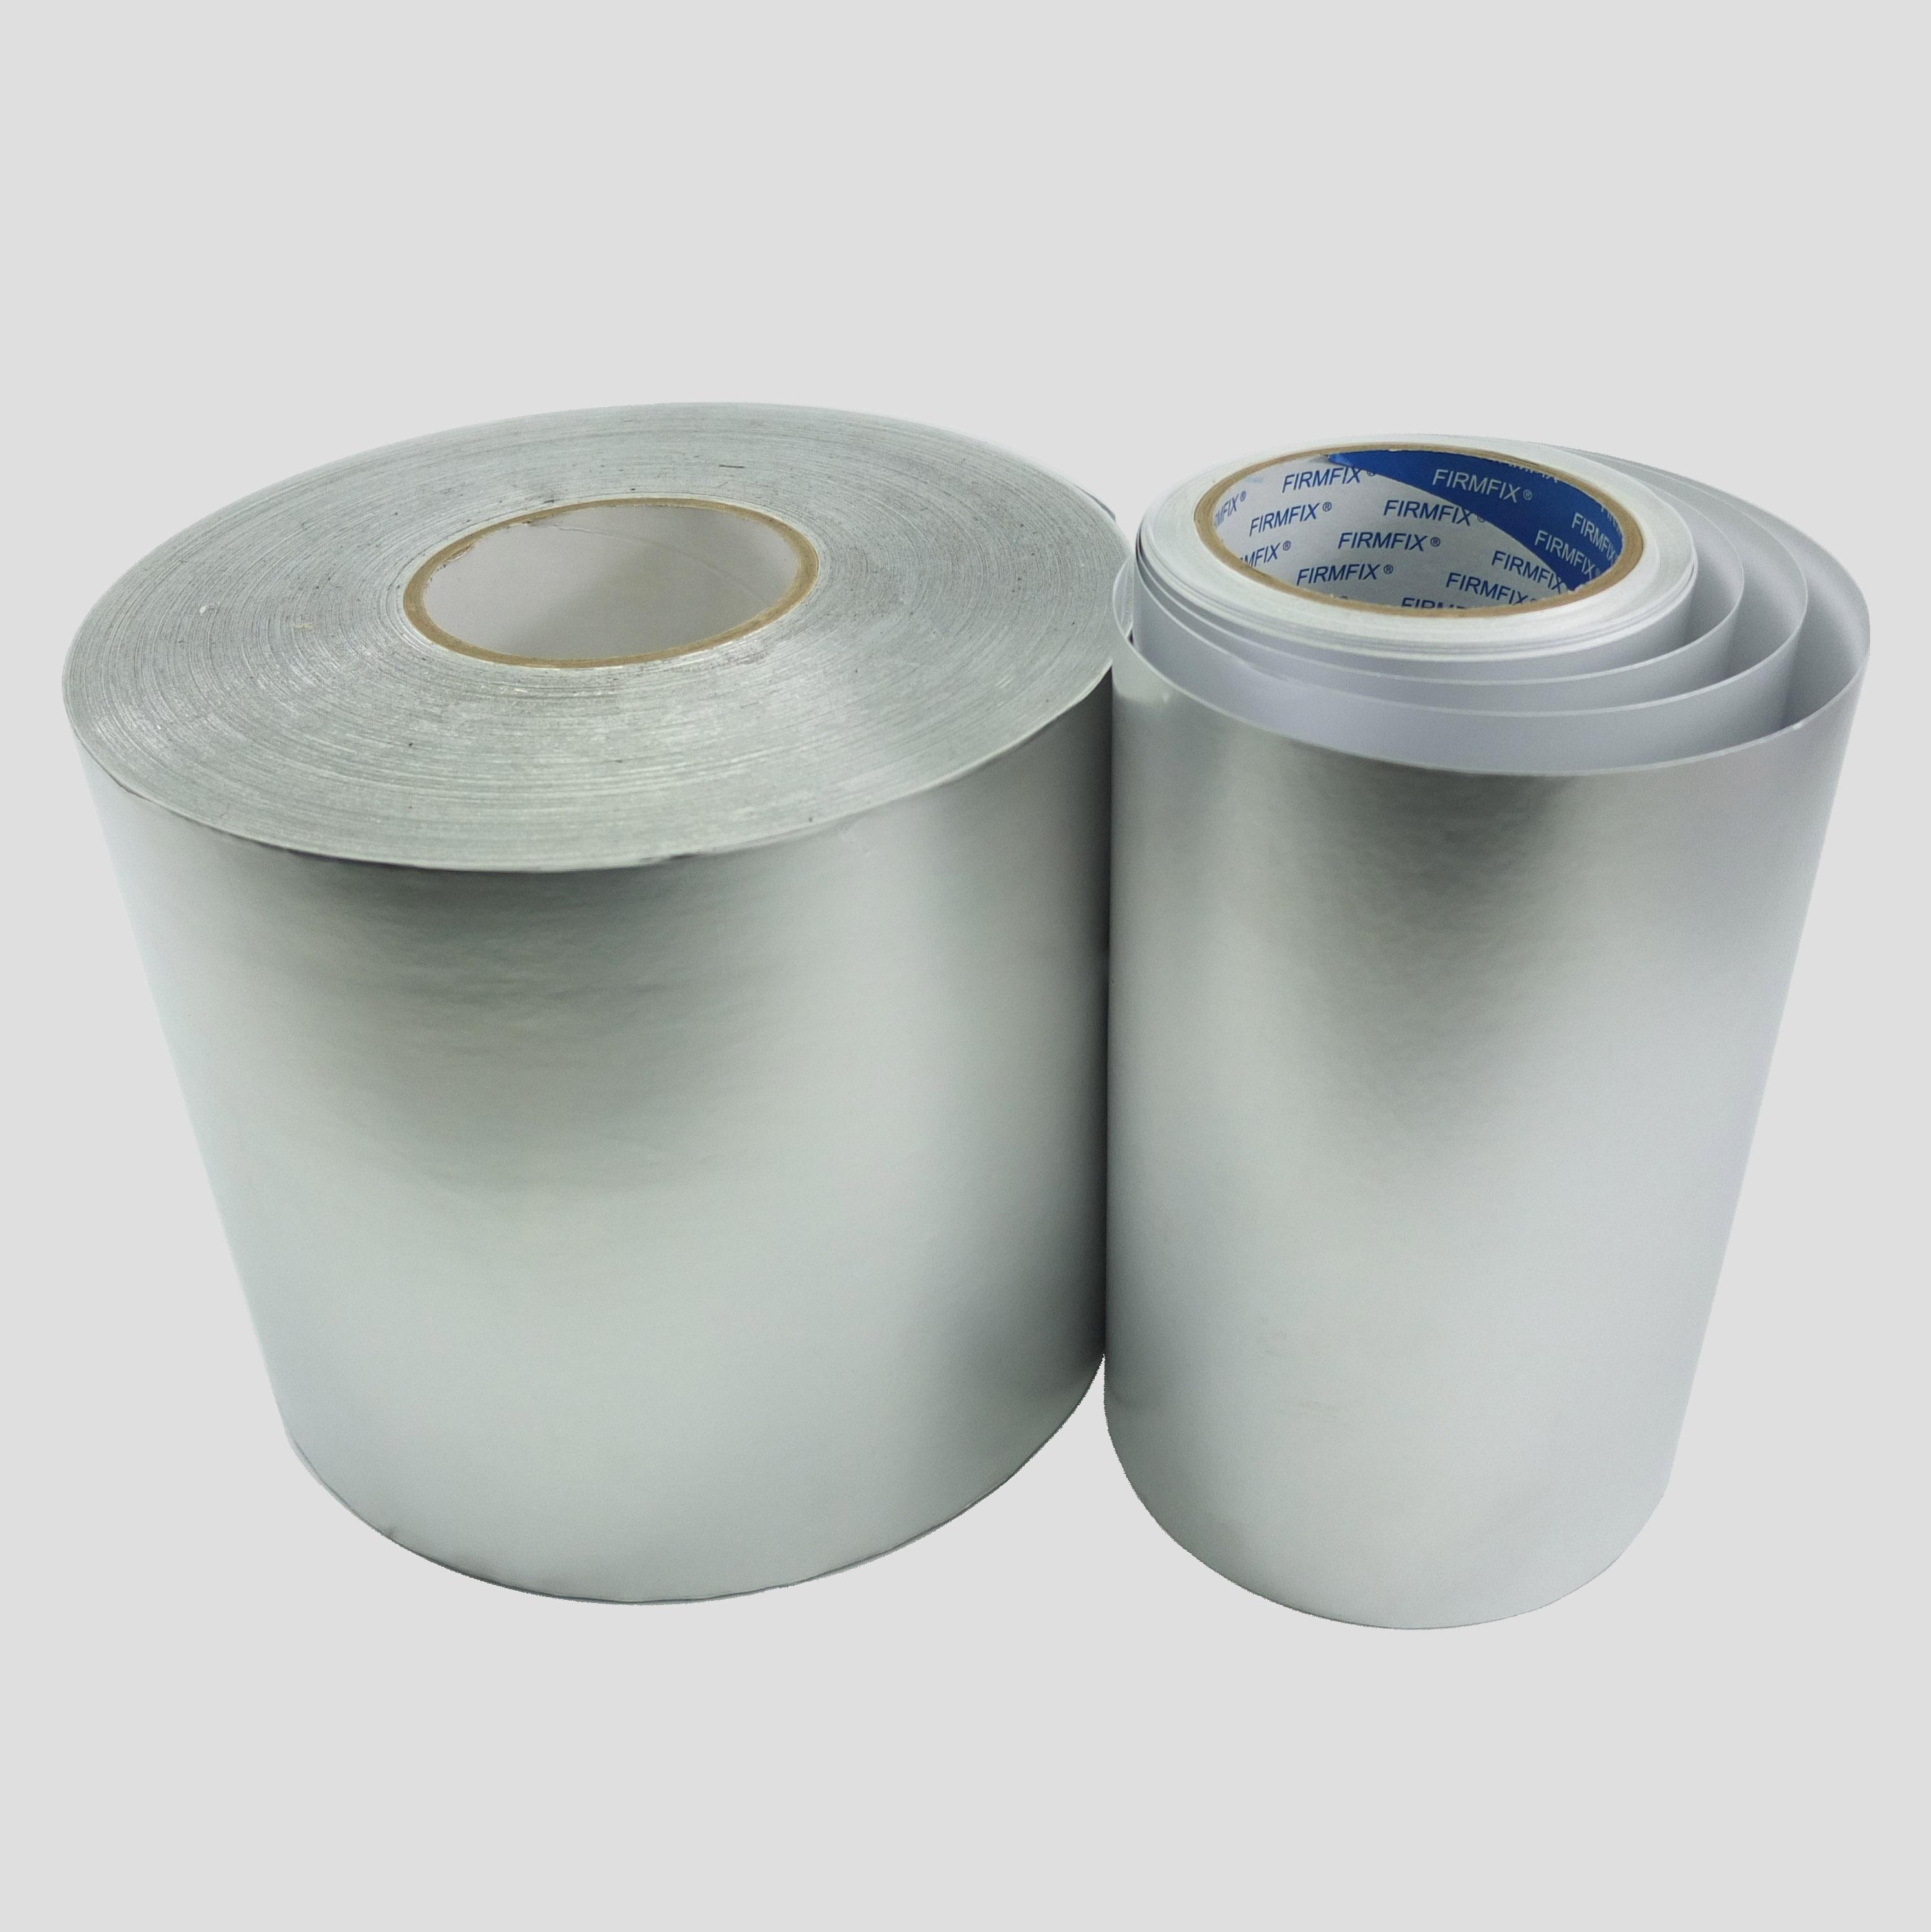 FIRMFIX Grounding Tape / EMI Shielding Tape / ESD Tape